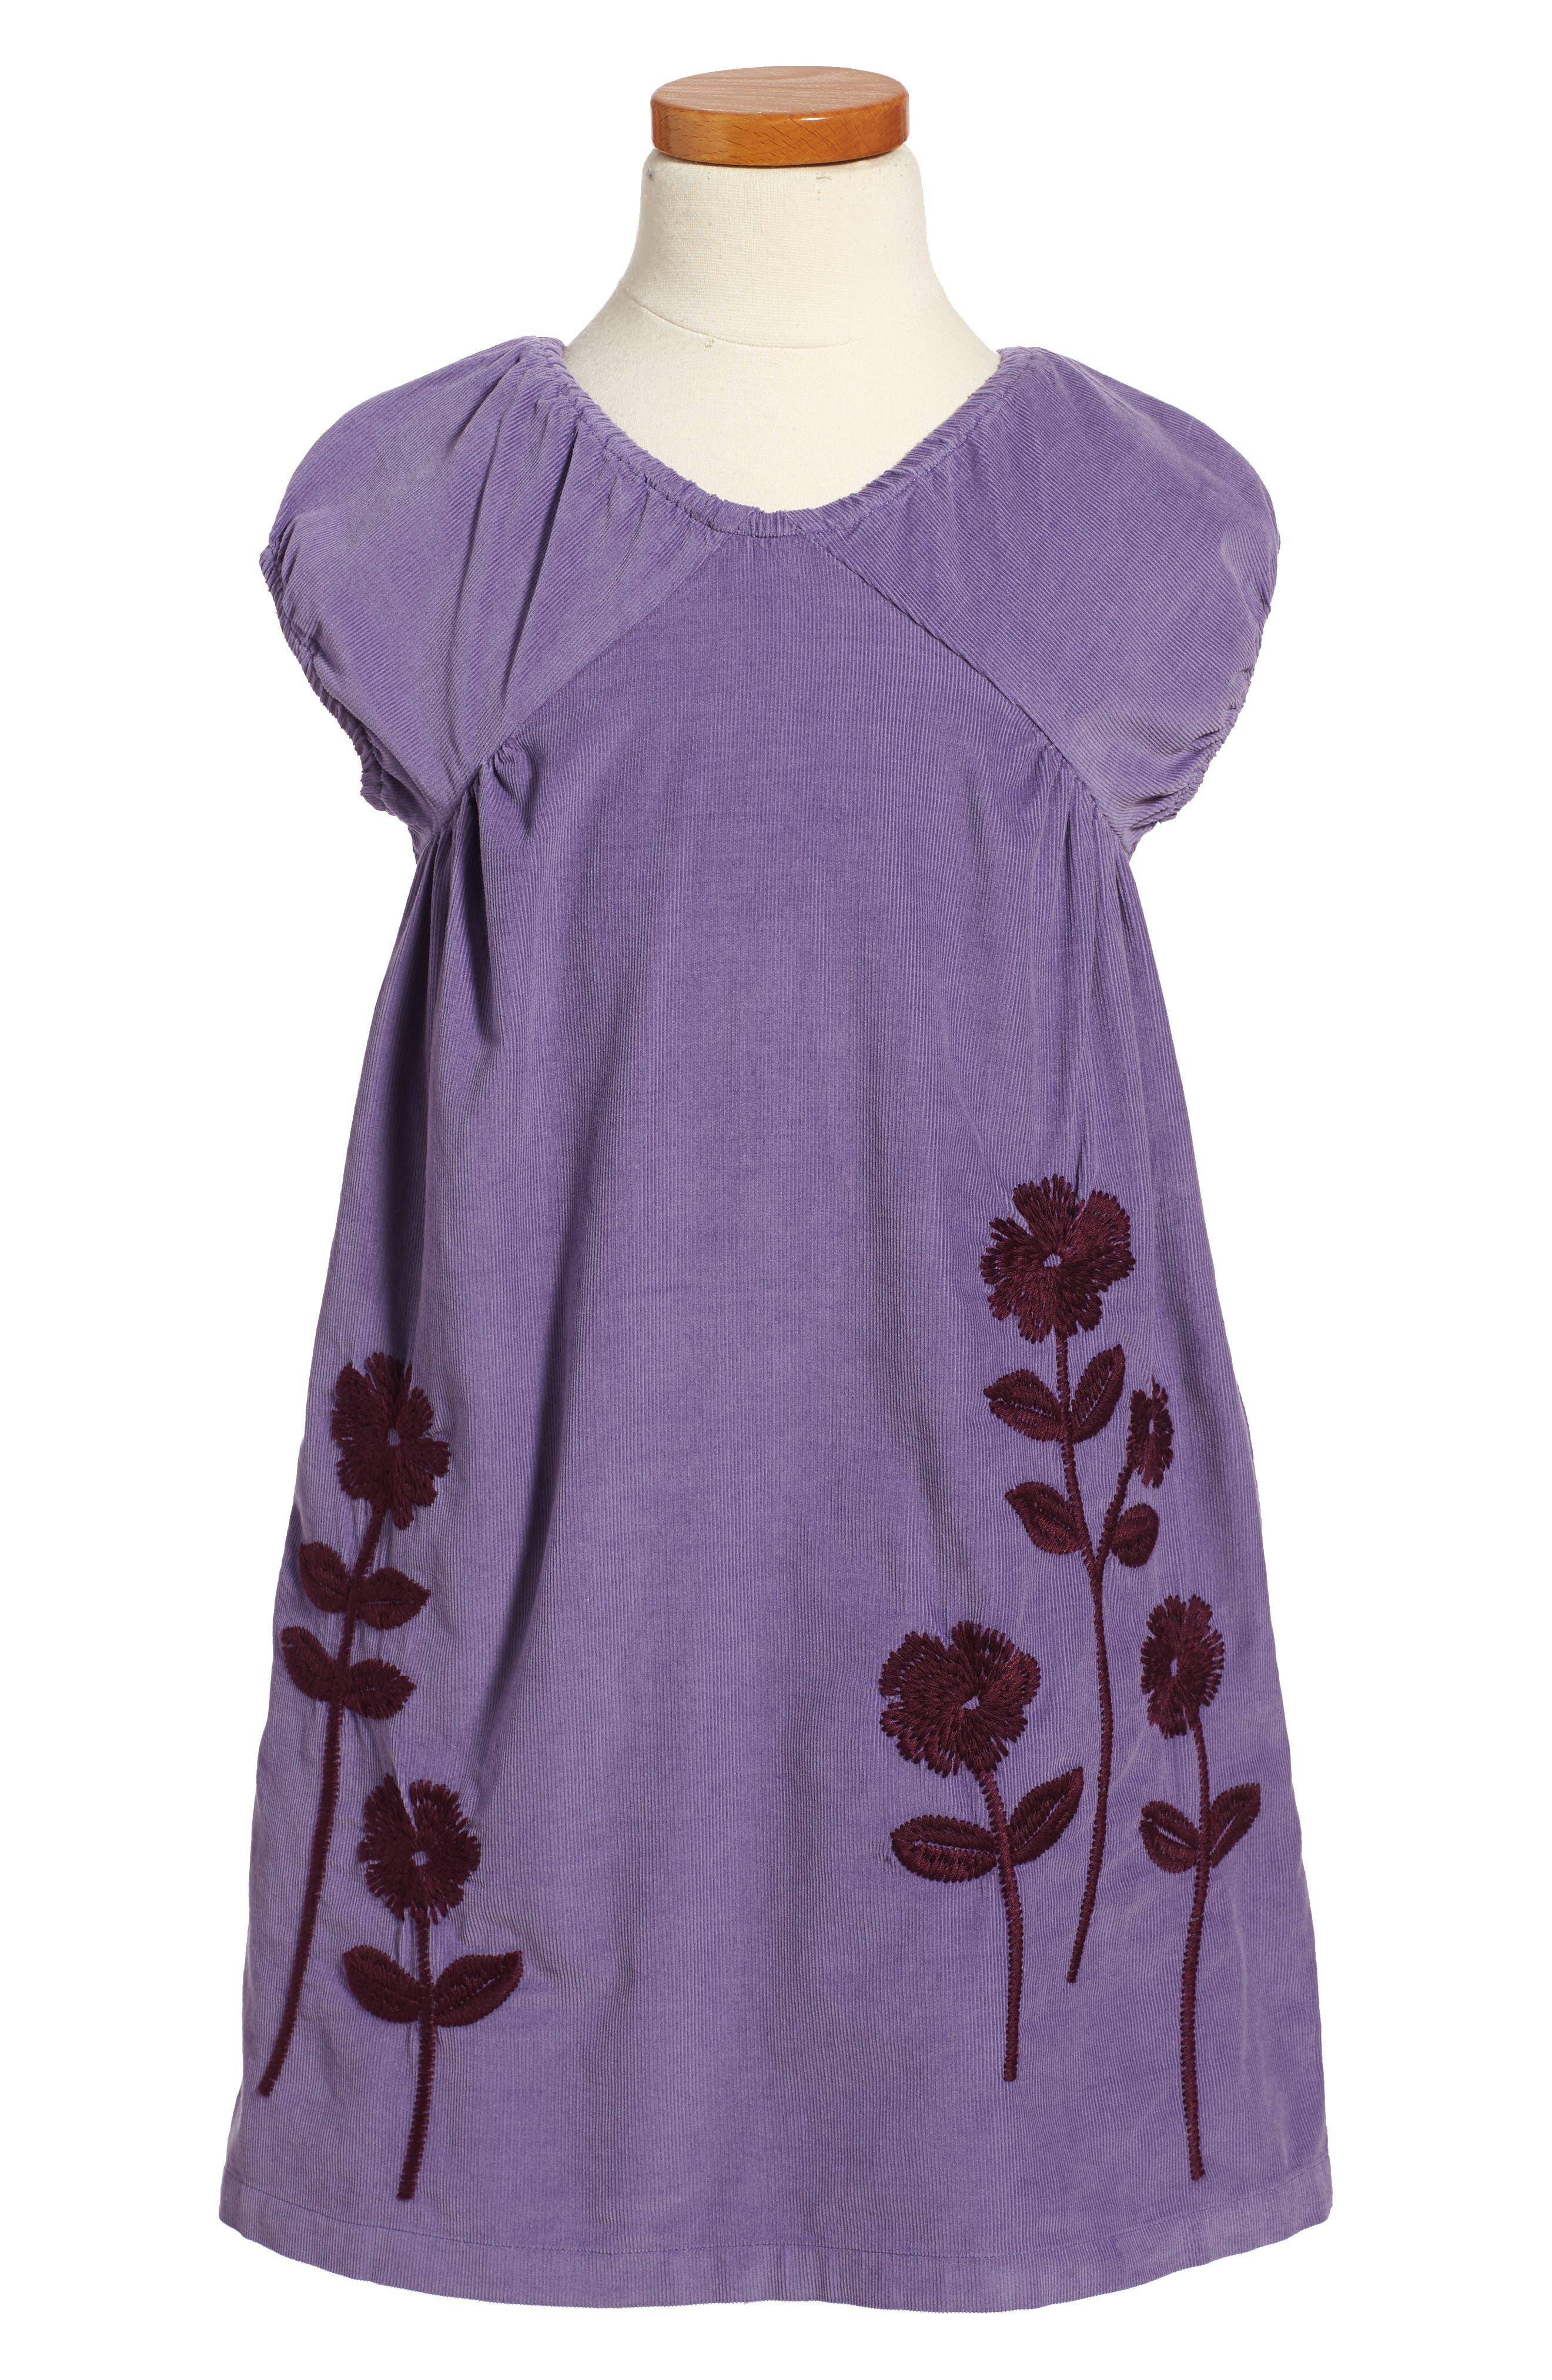 Cullodena Corduroy Dress,                             Main thumbnail 1, color,                             519